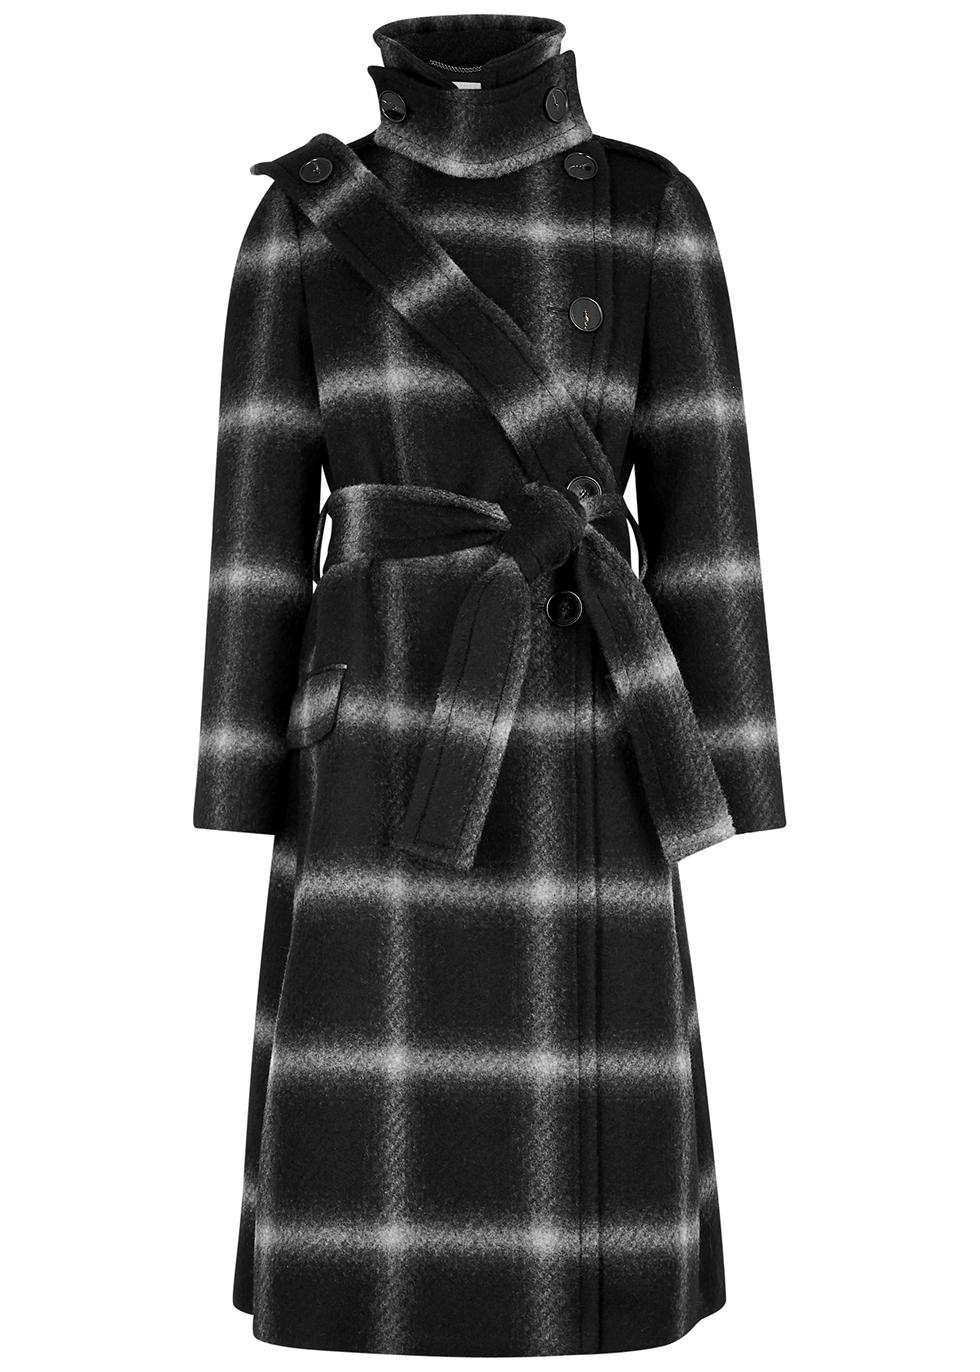 Sophia checked wool coat